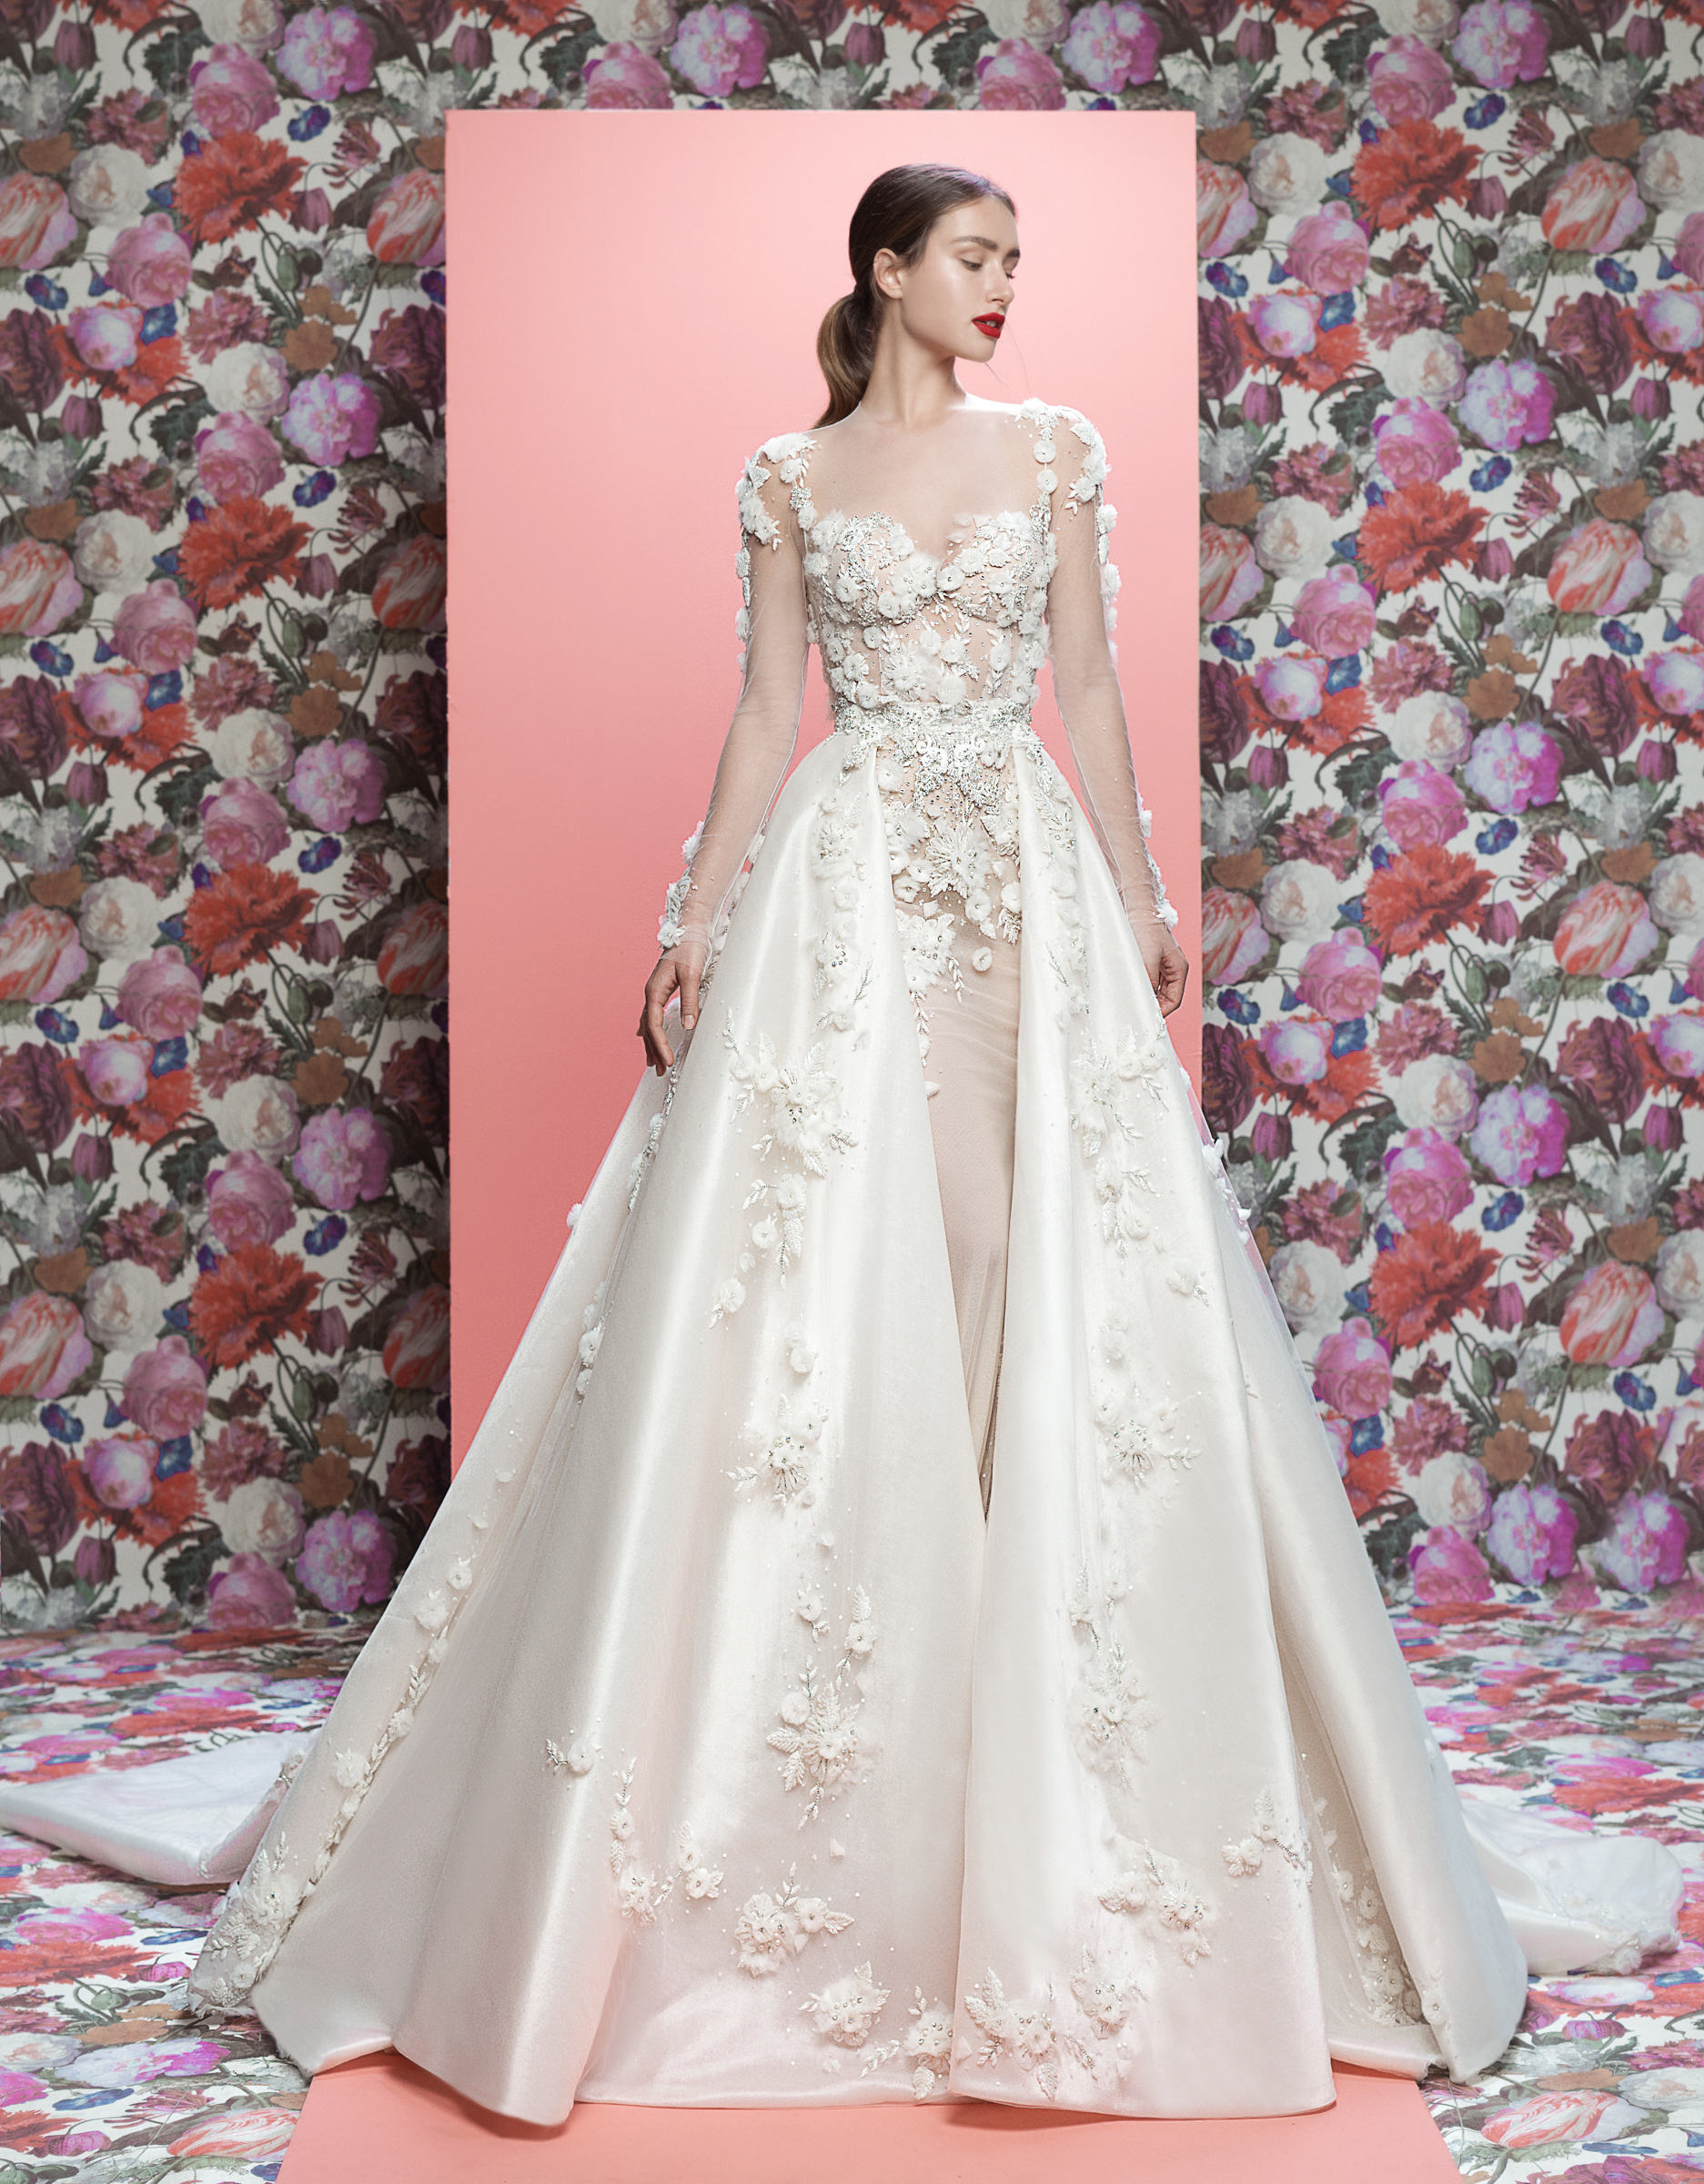 Galia Lahav wedding dress spring 2019 long sleeve sweetheart ball gown